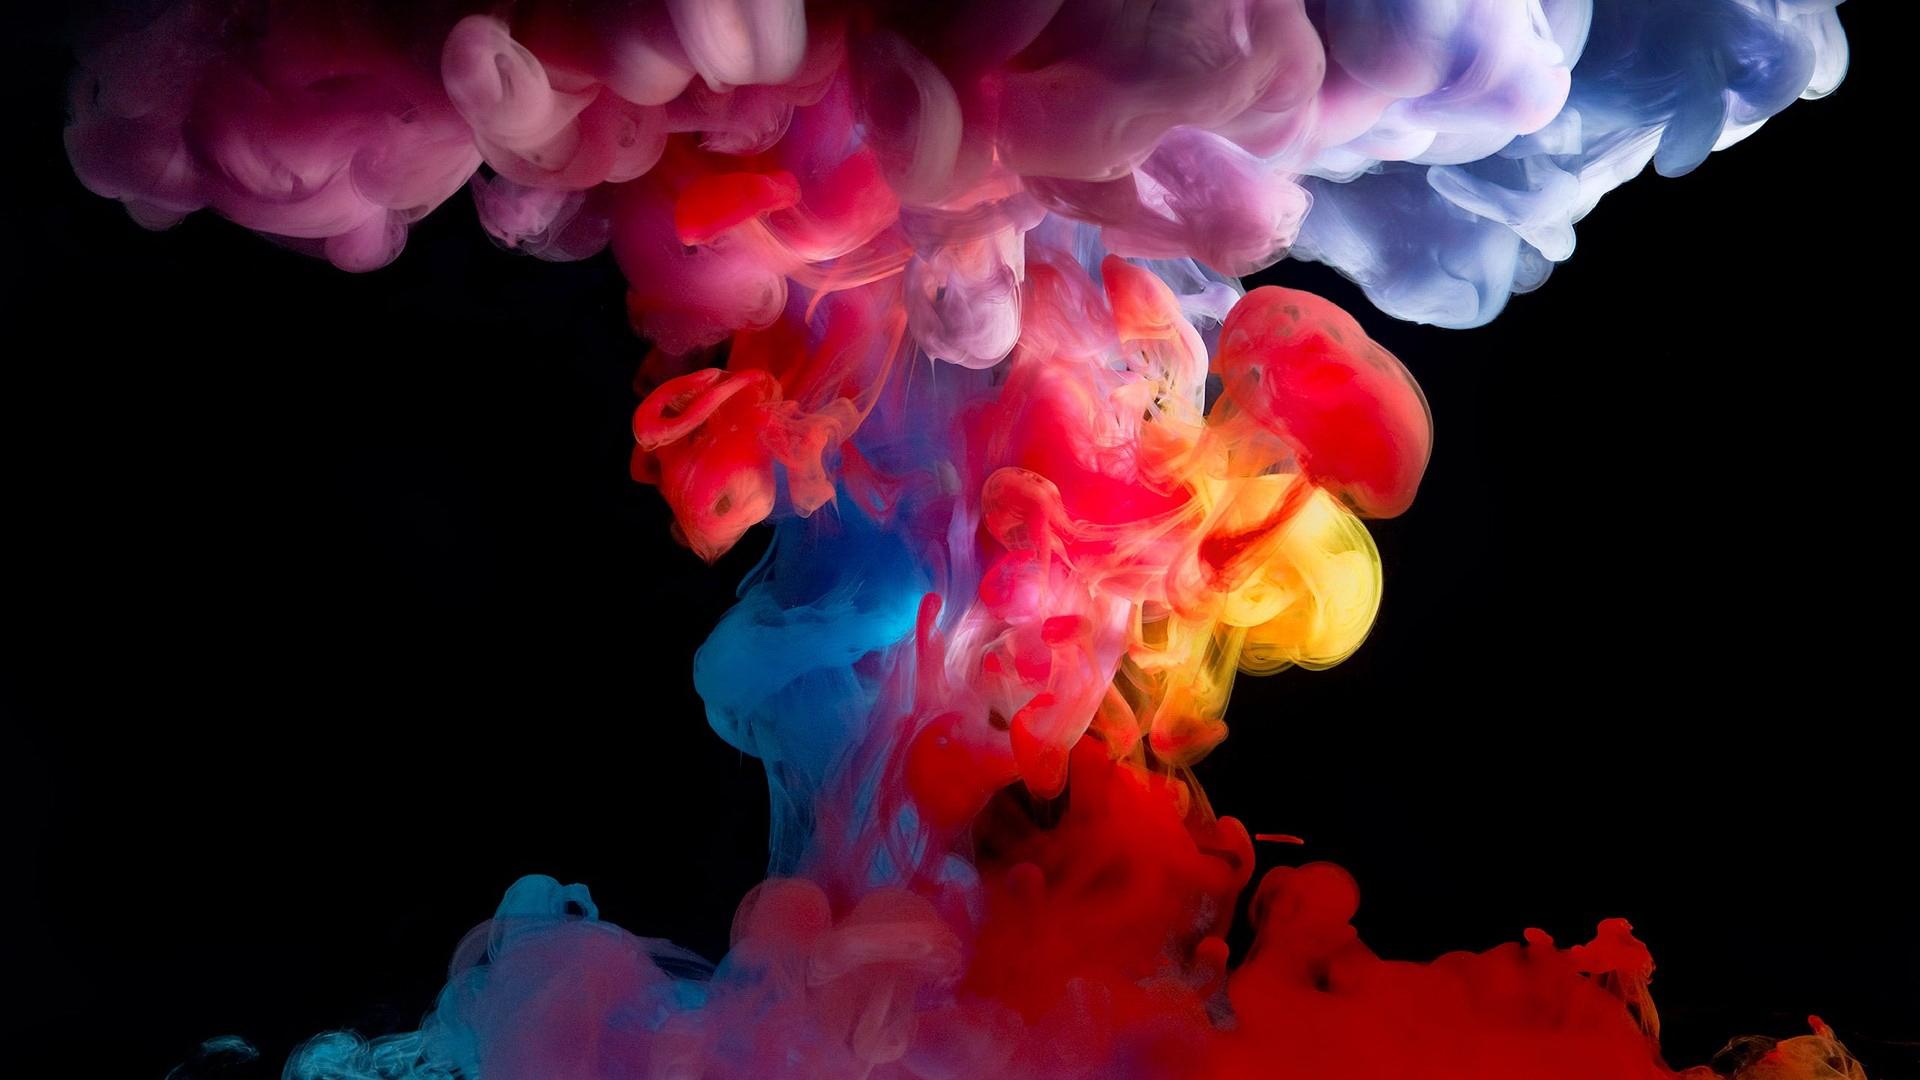 Smoke Wallpapers Hd